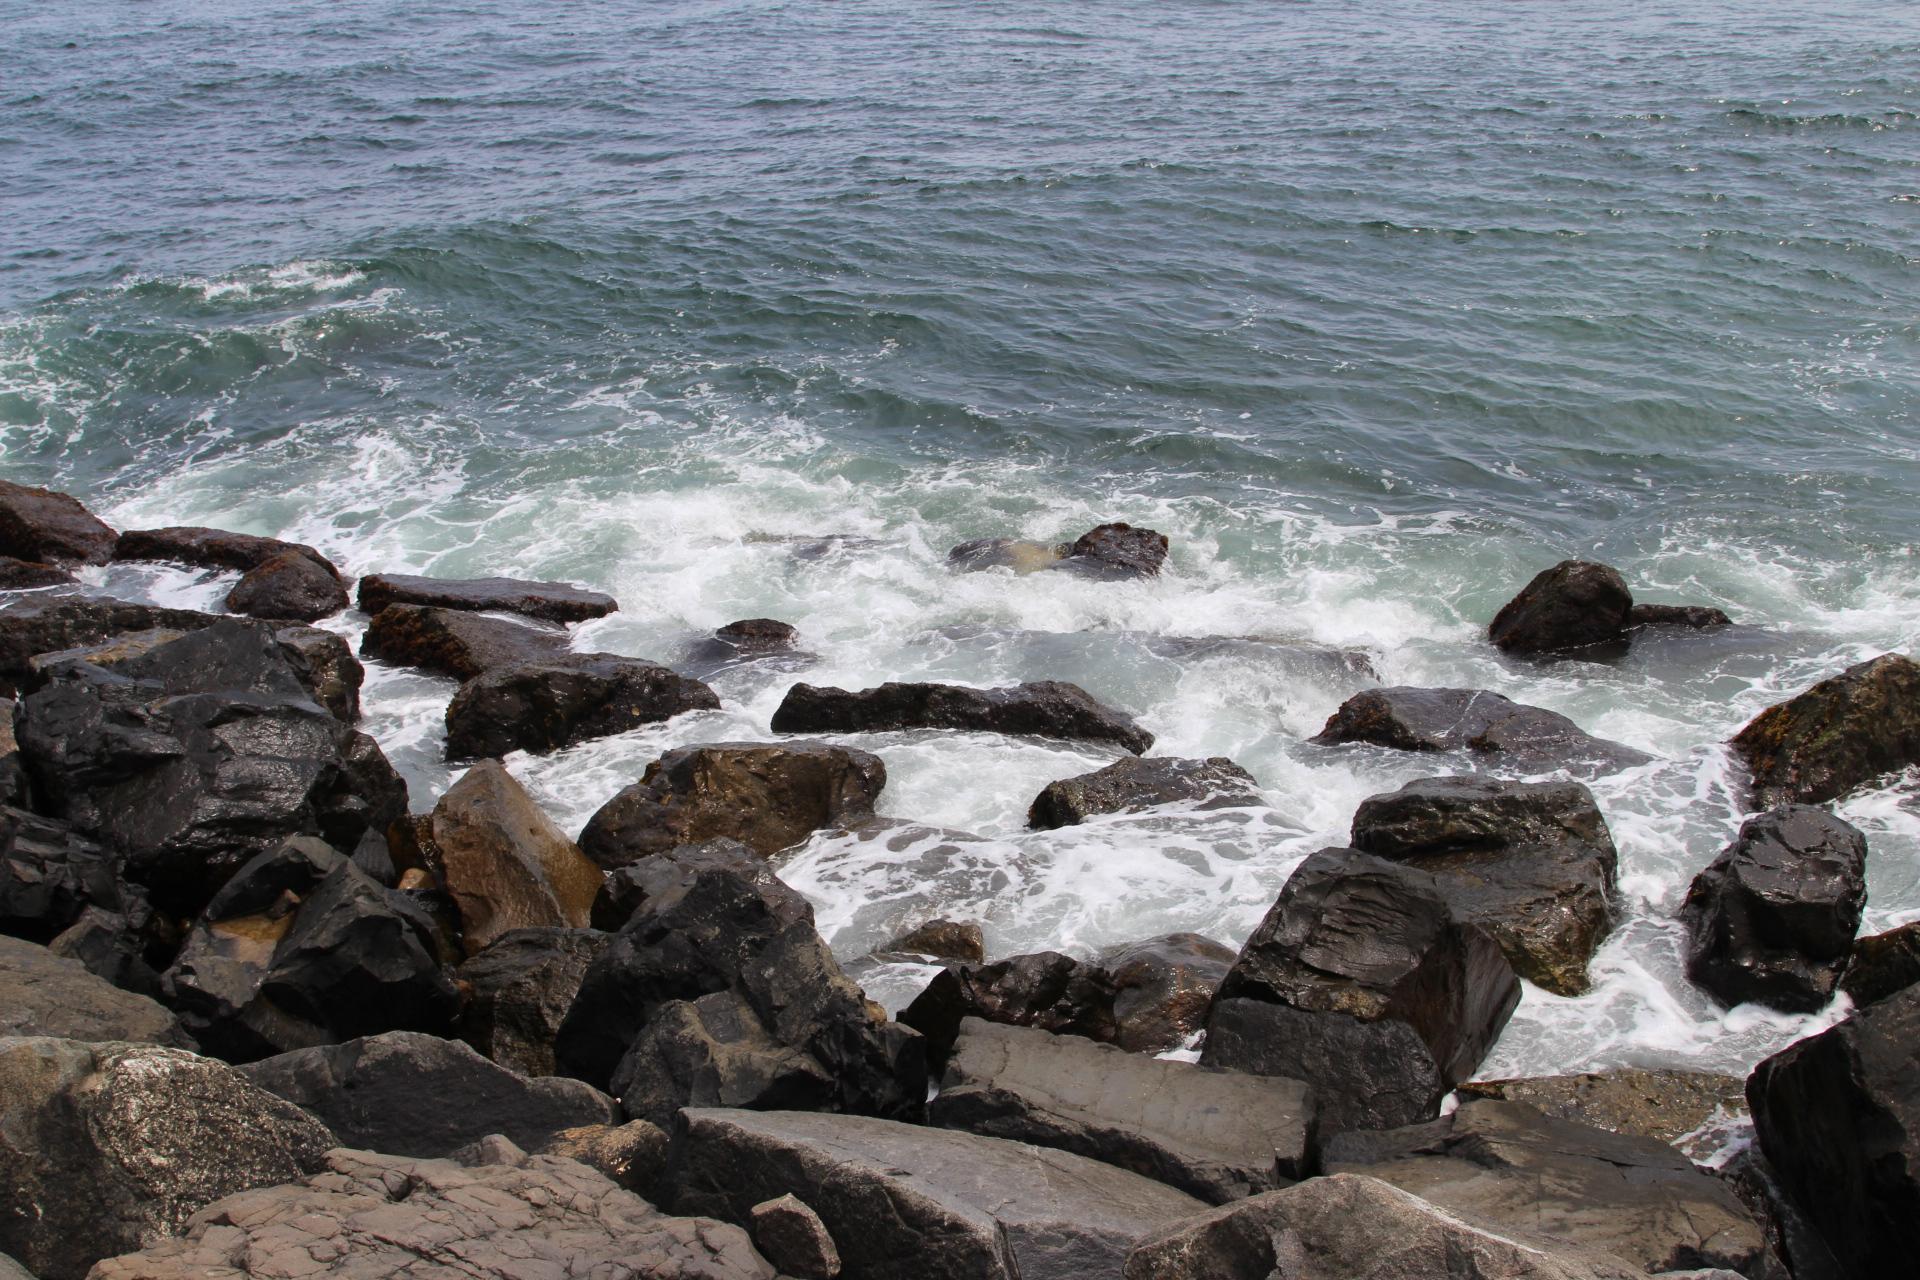 Rocks at watrers edge_1